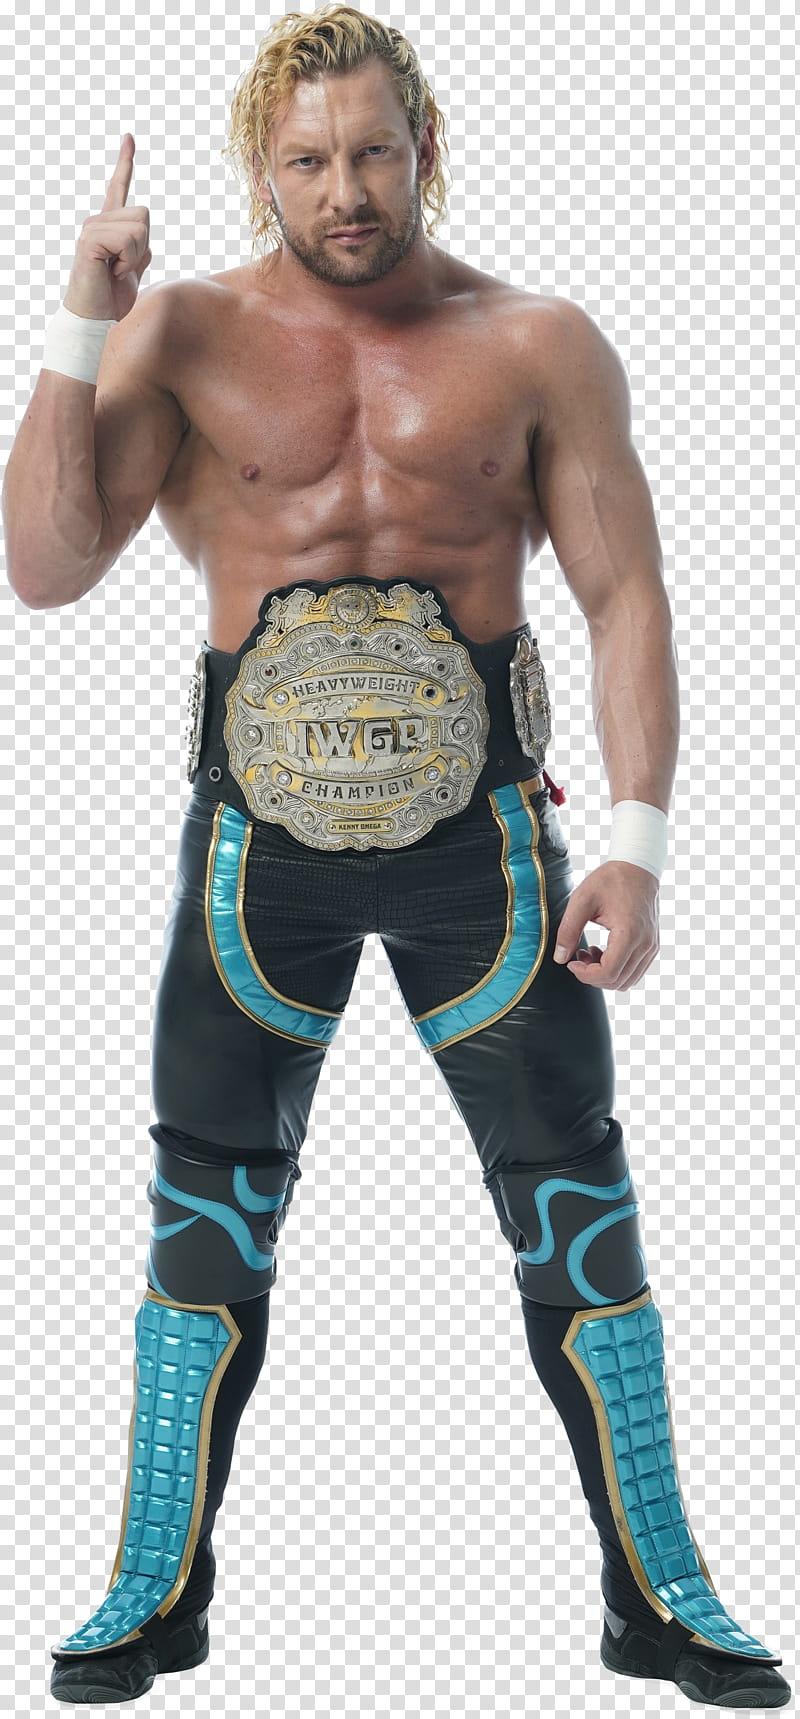 Kenny Omega IWGP Heavyweight Champion transparent background.